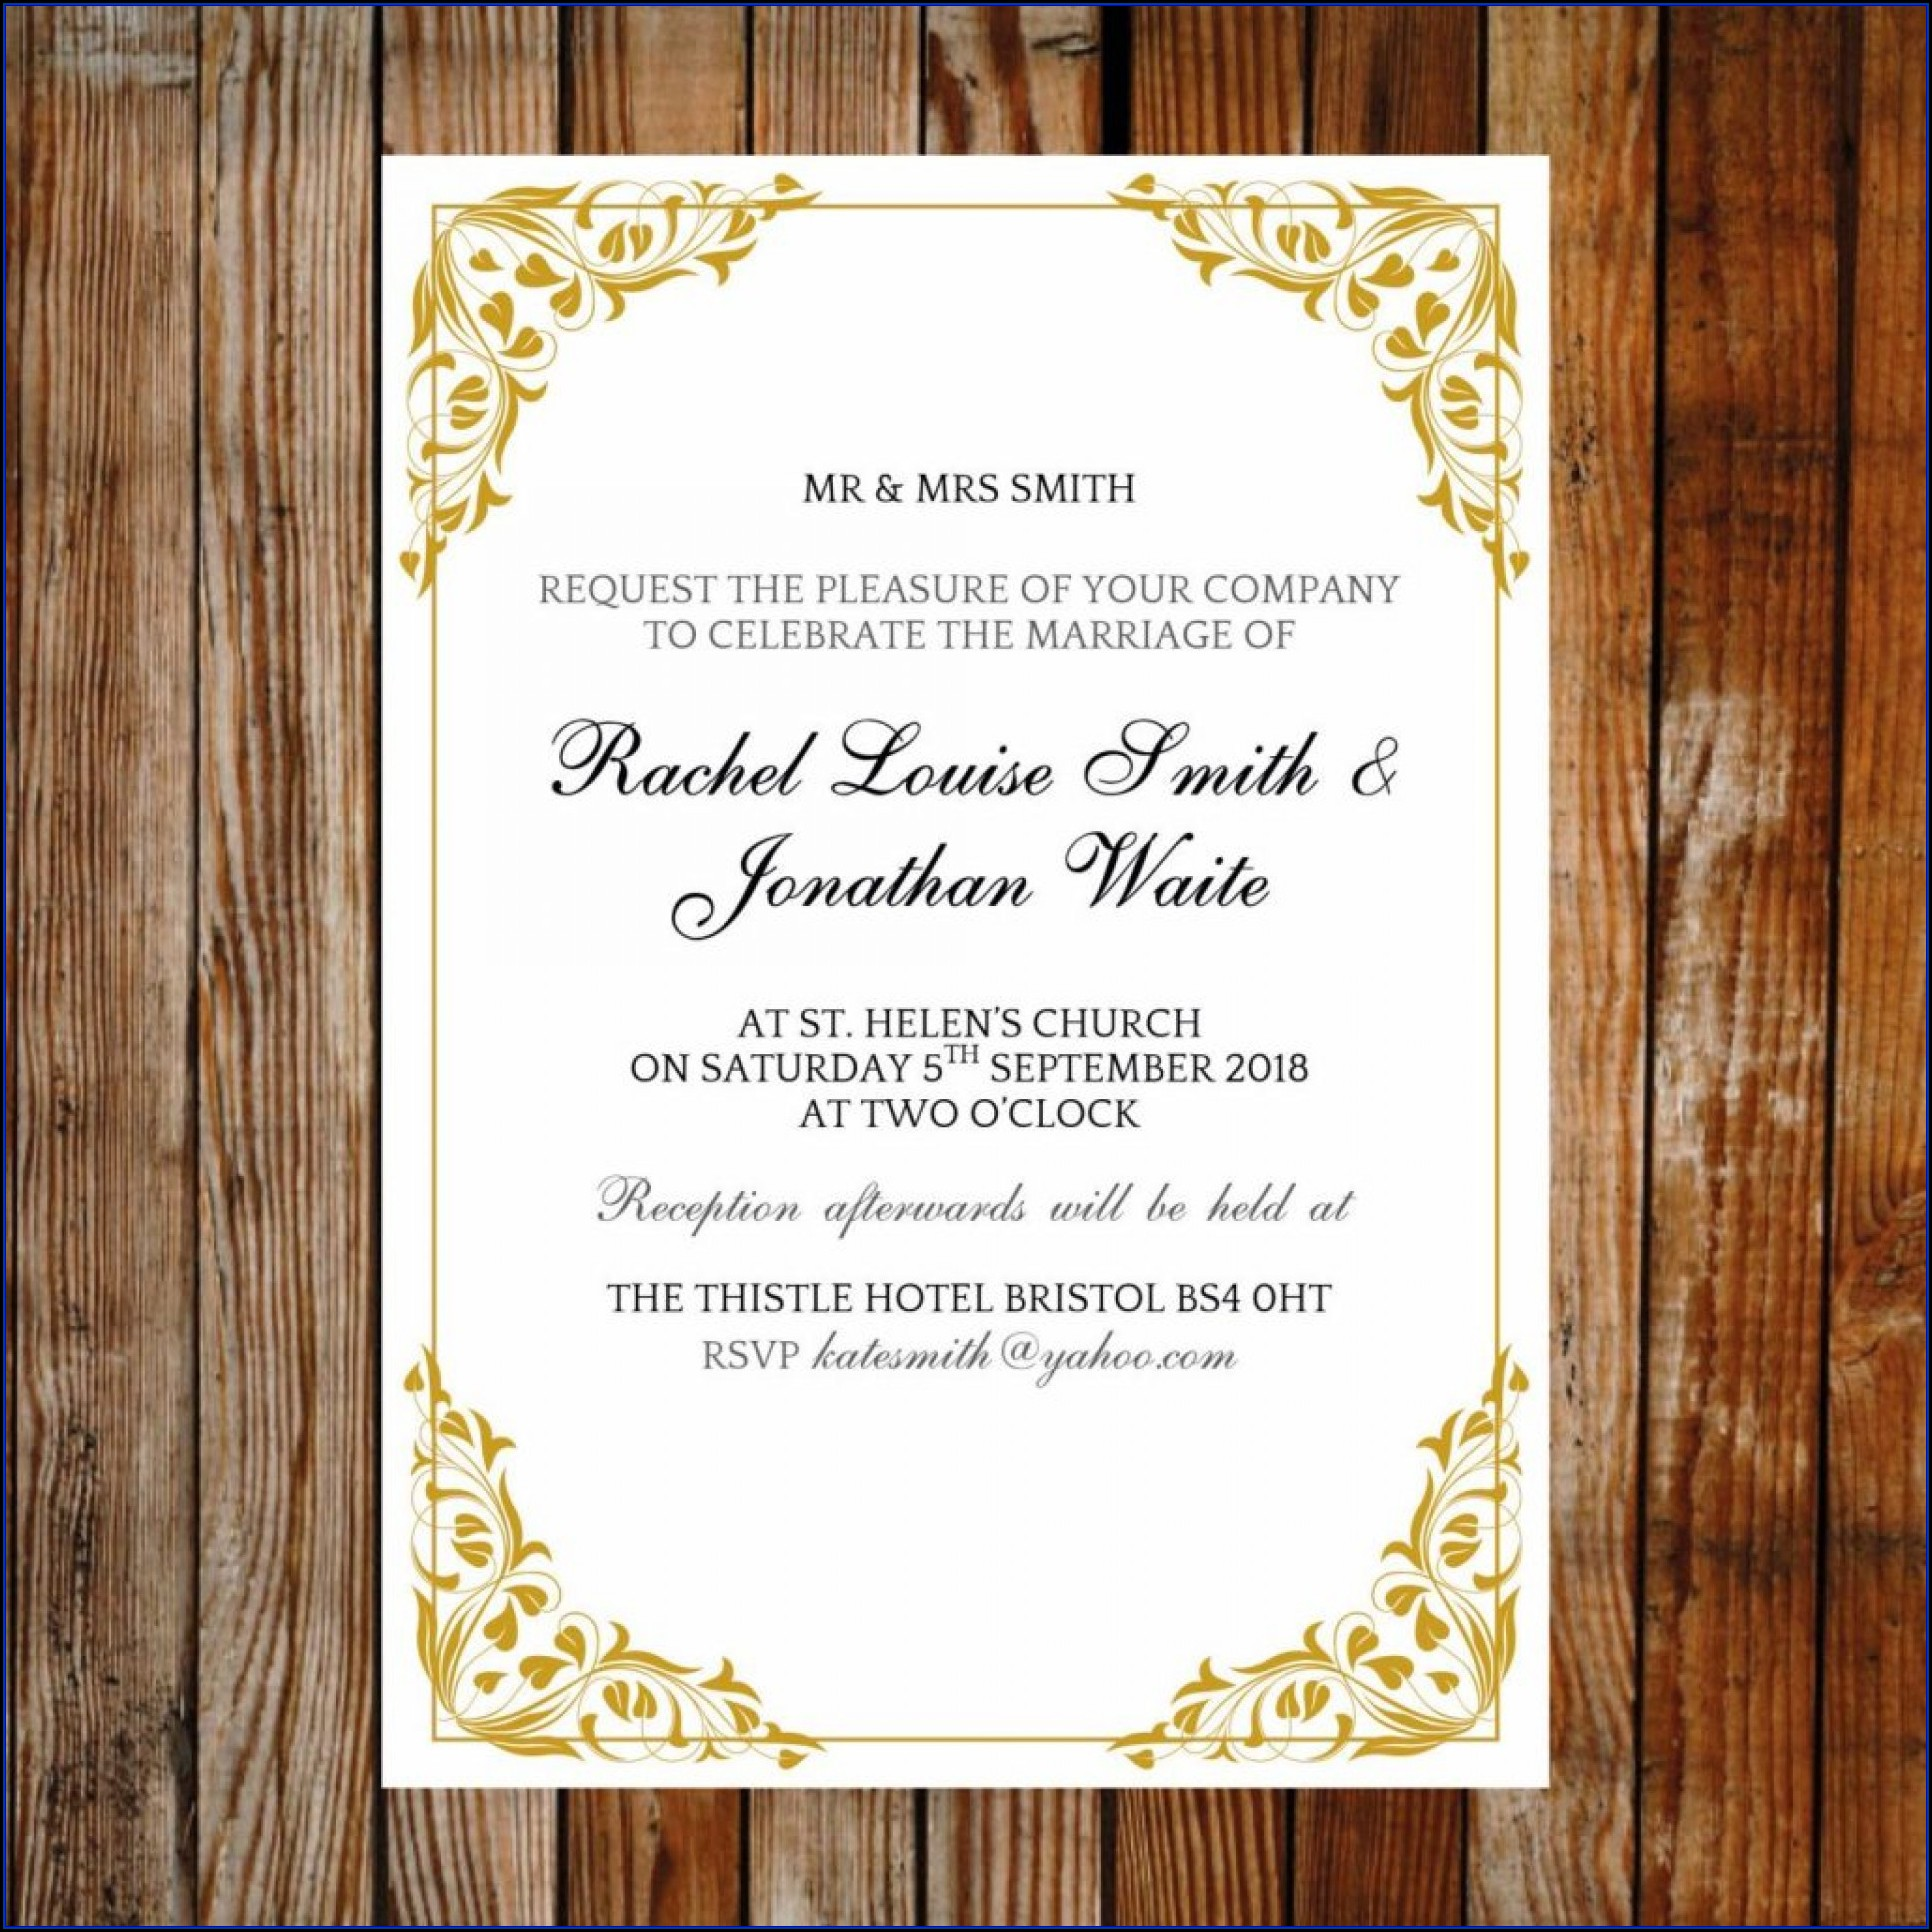 Reception Invitation Templates Free Download